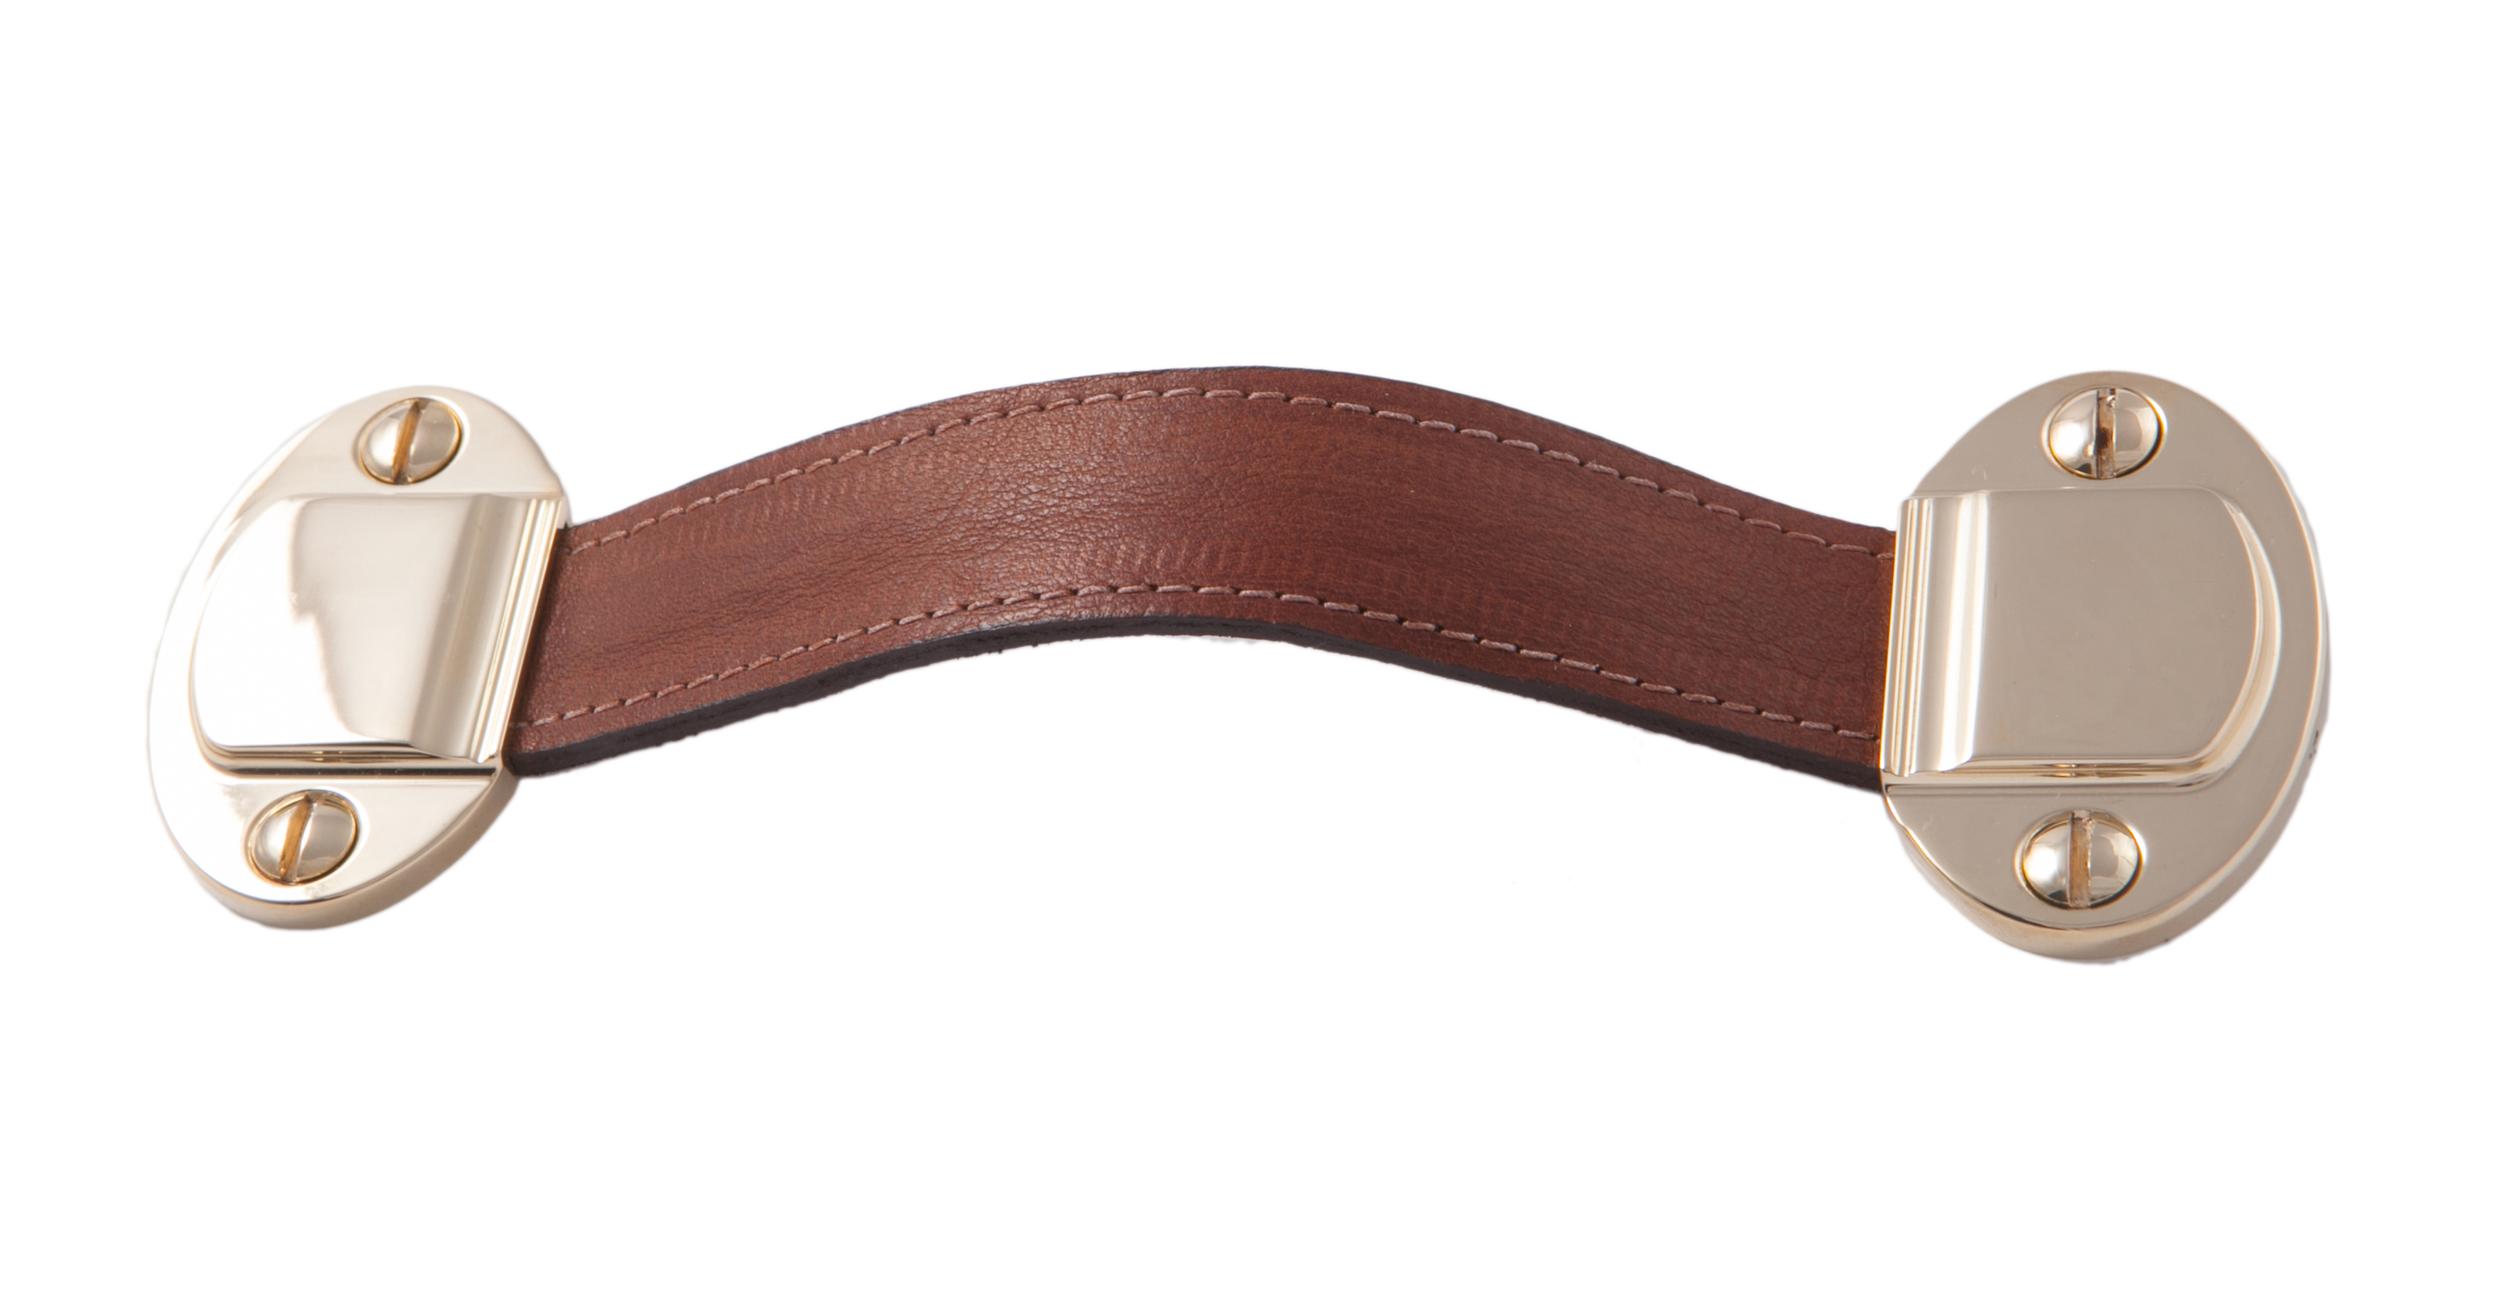 wh-medford-leather-custom